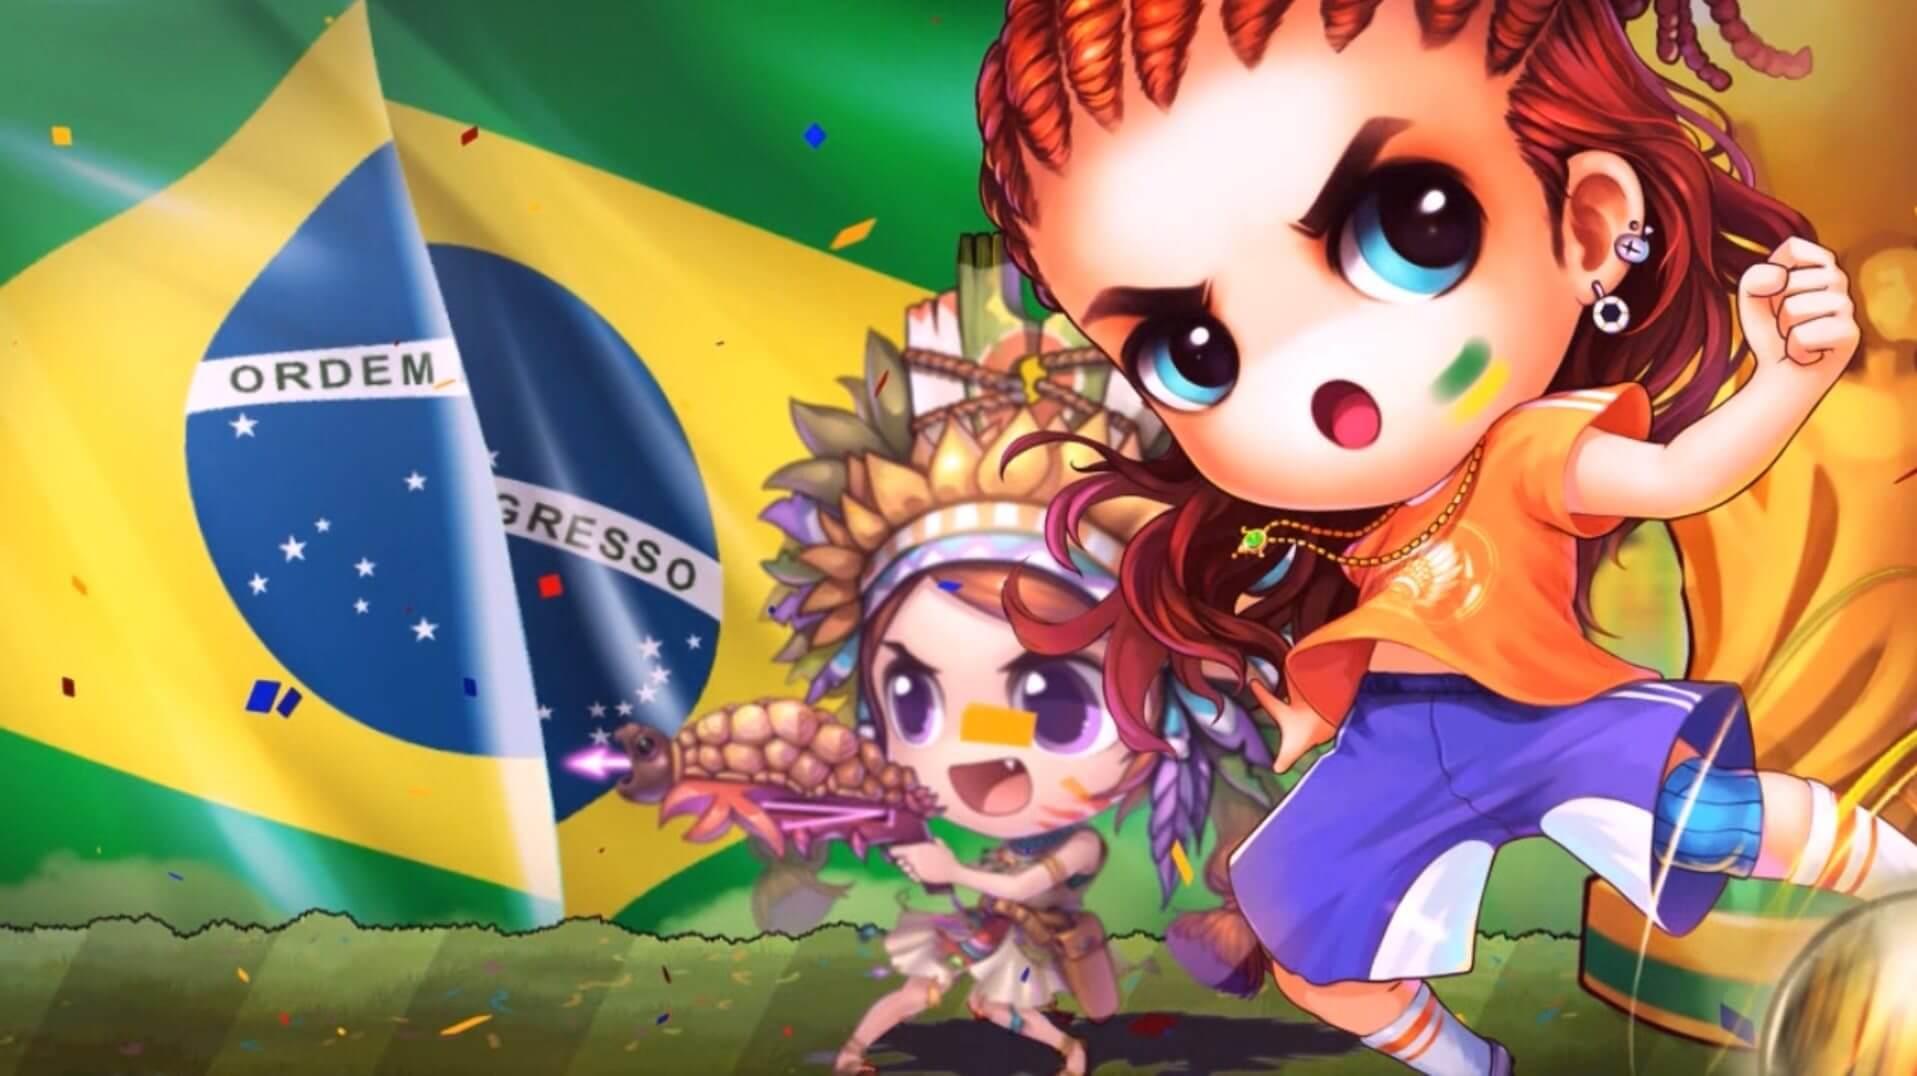 ddtank mobile brasil 2 - Game DDTank recebe versão em português para dispositivos Android